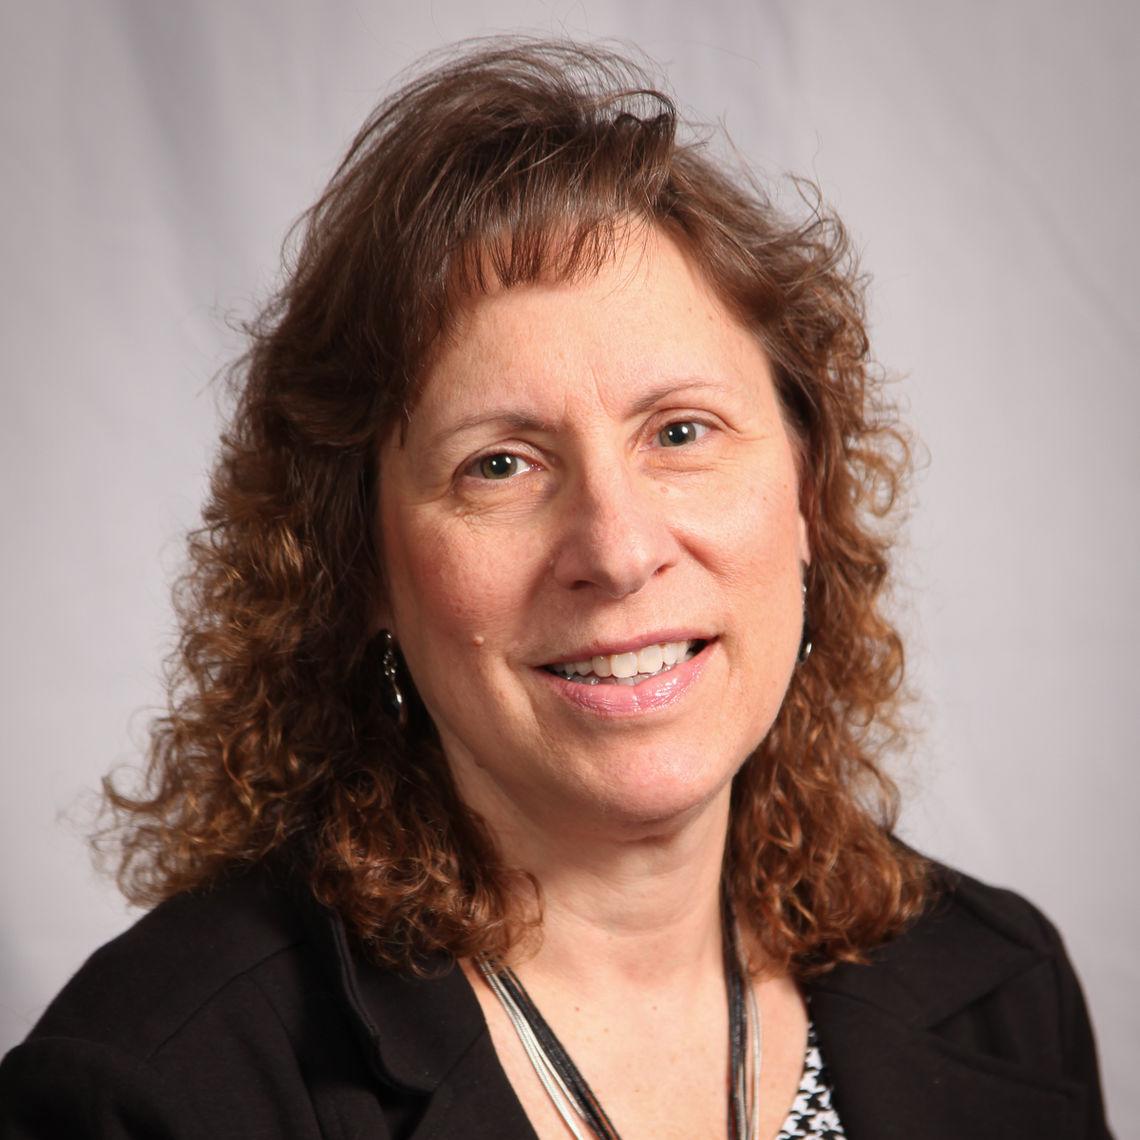 Sharon Gromis